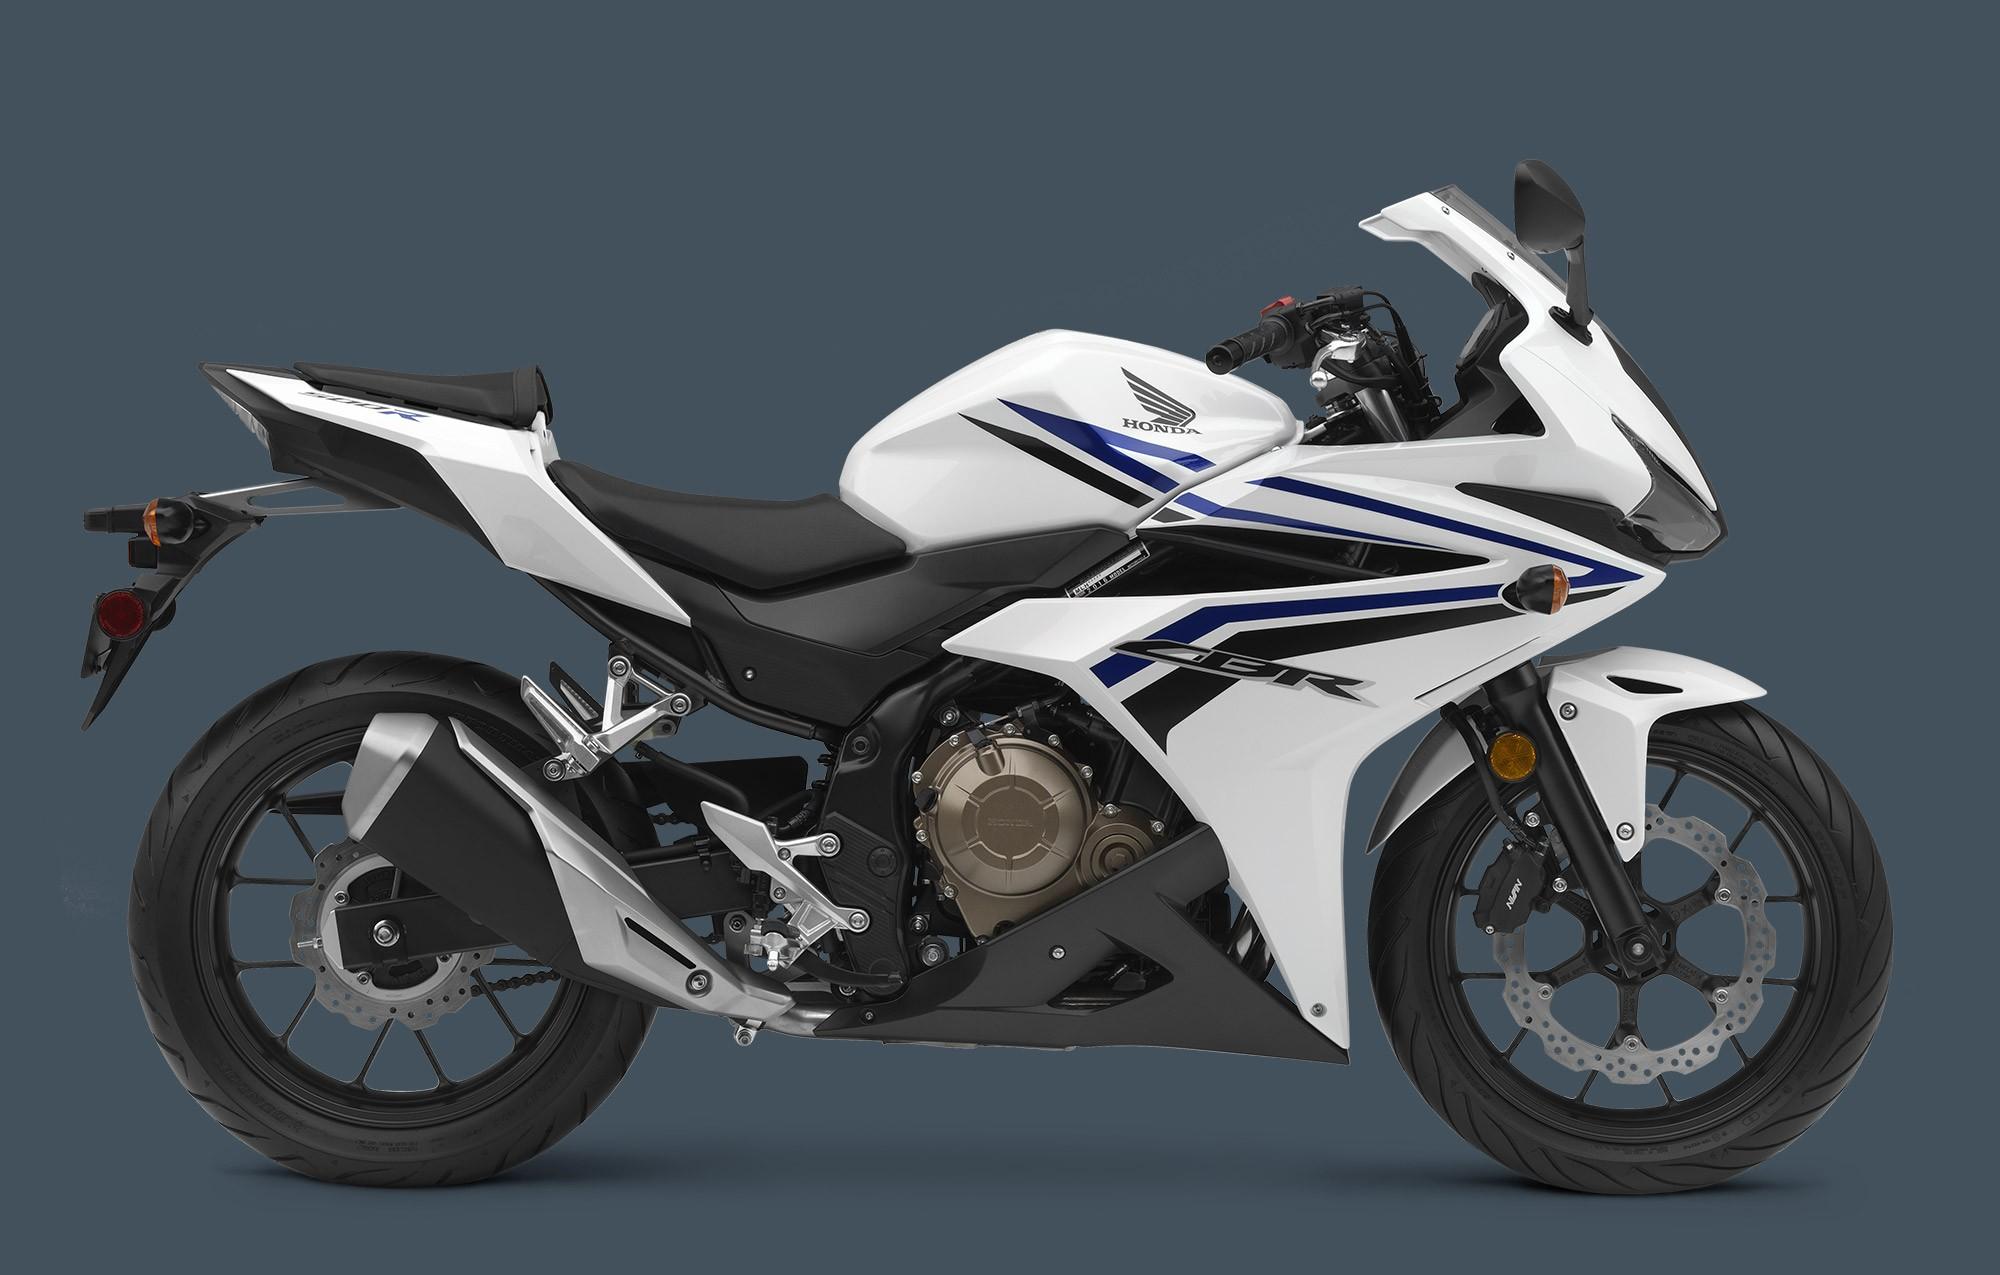 2016 honda cbr500r unveiled looks sharp and agile   autoevolution